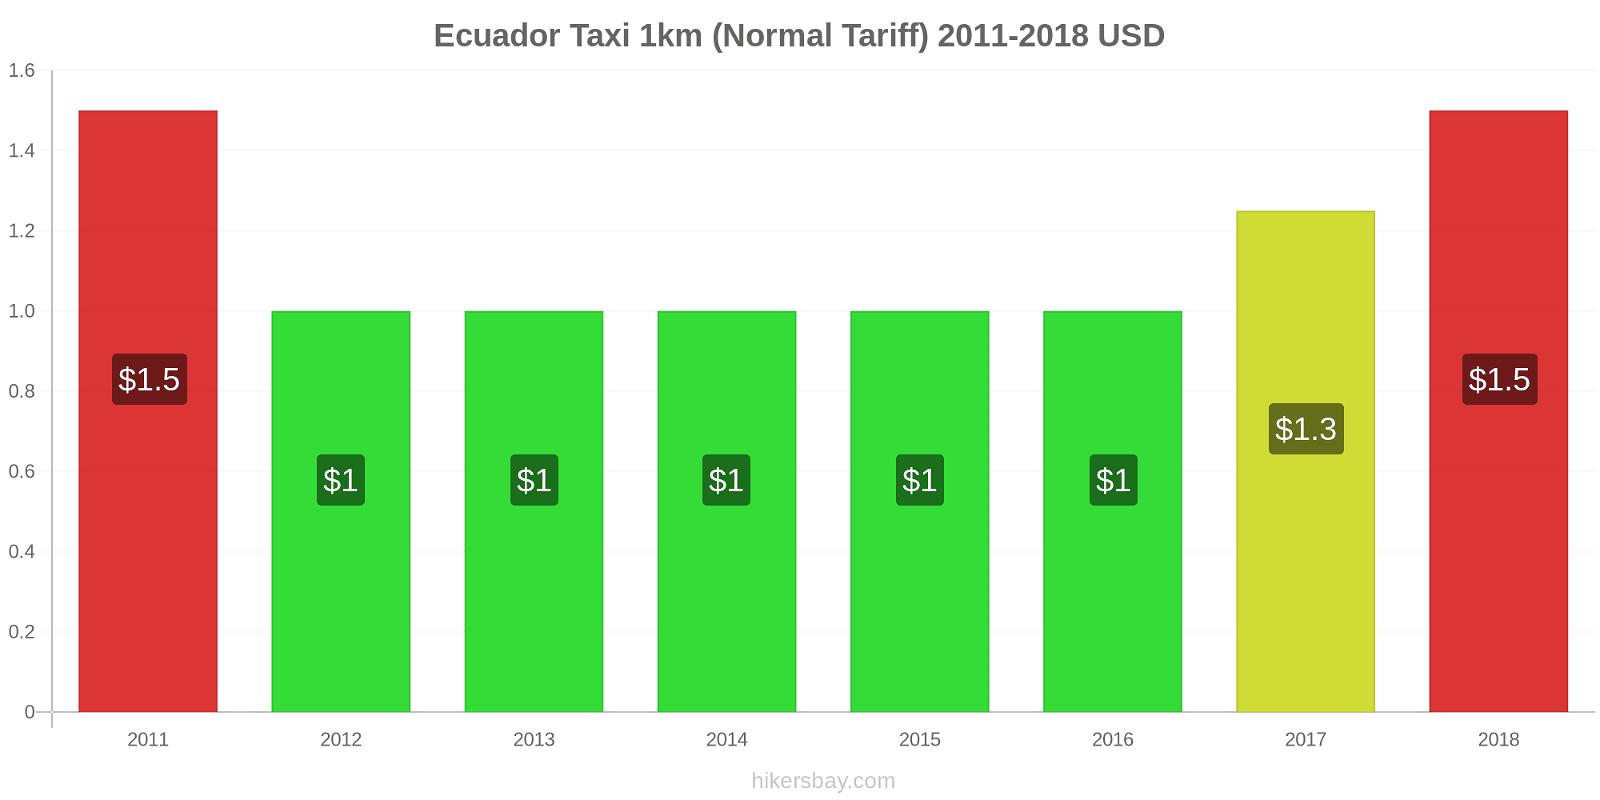 Ecuador price changes Taxi 1km (Normal Tariff) hikersbay.com